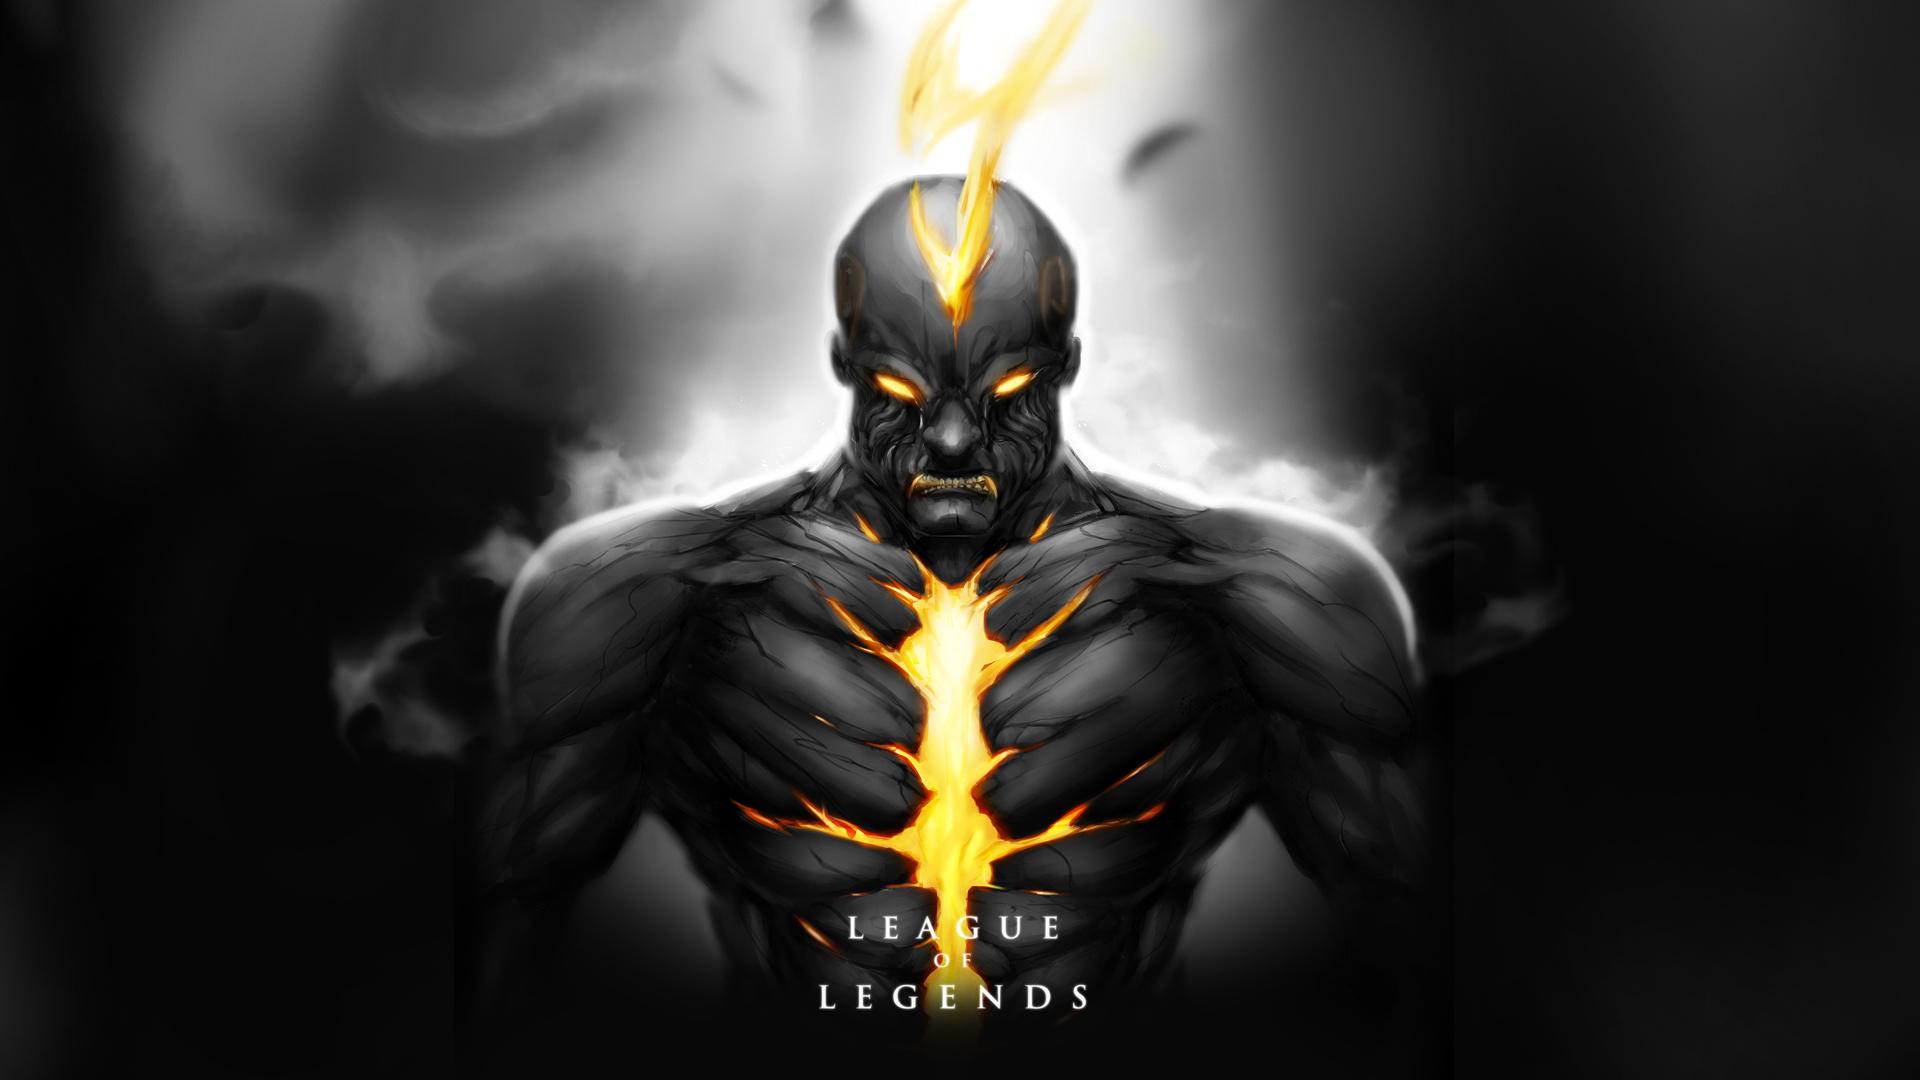 brand champion art league of legends lol game hd 1920x1080 1080p 1920x1080